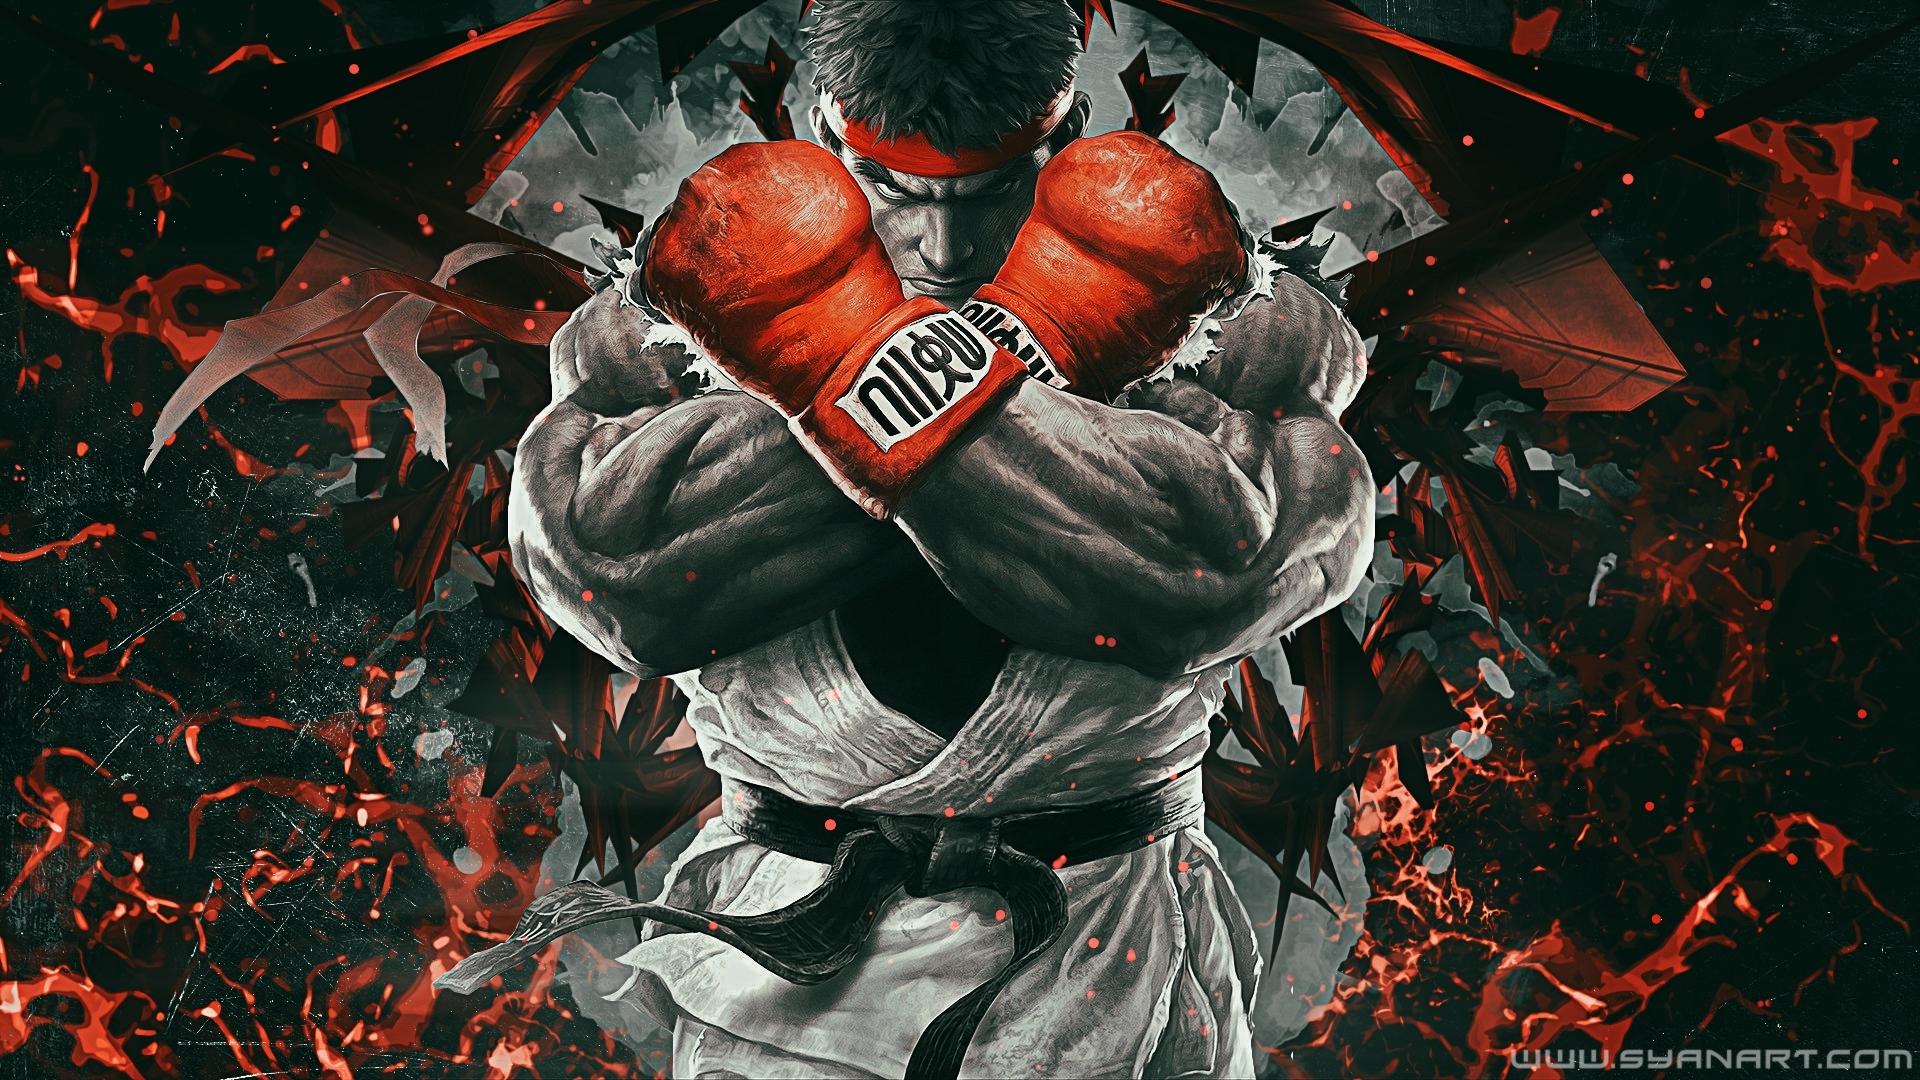 3150 ryu street fighter wallpaper